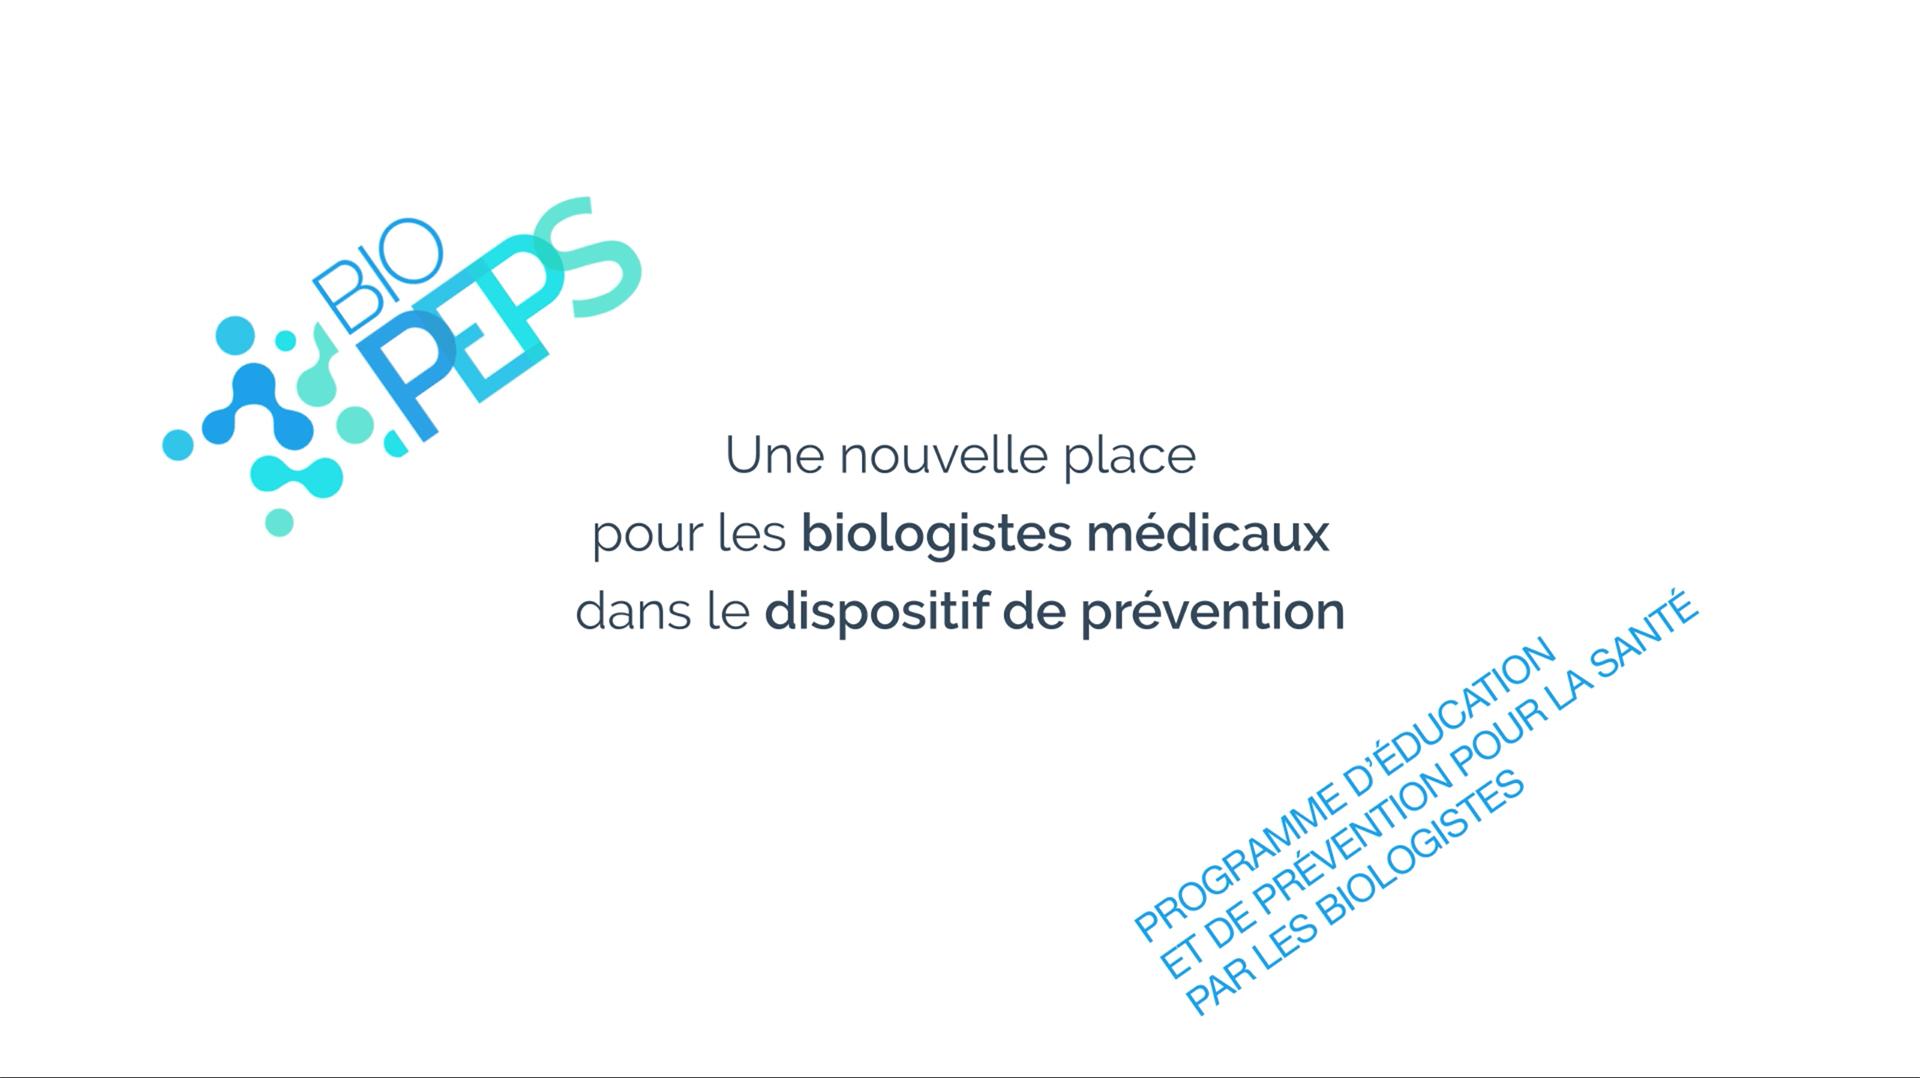 Biopeps